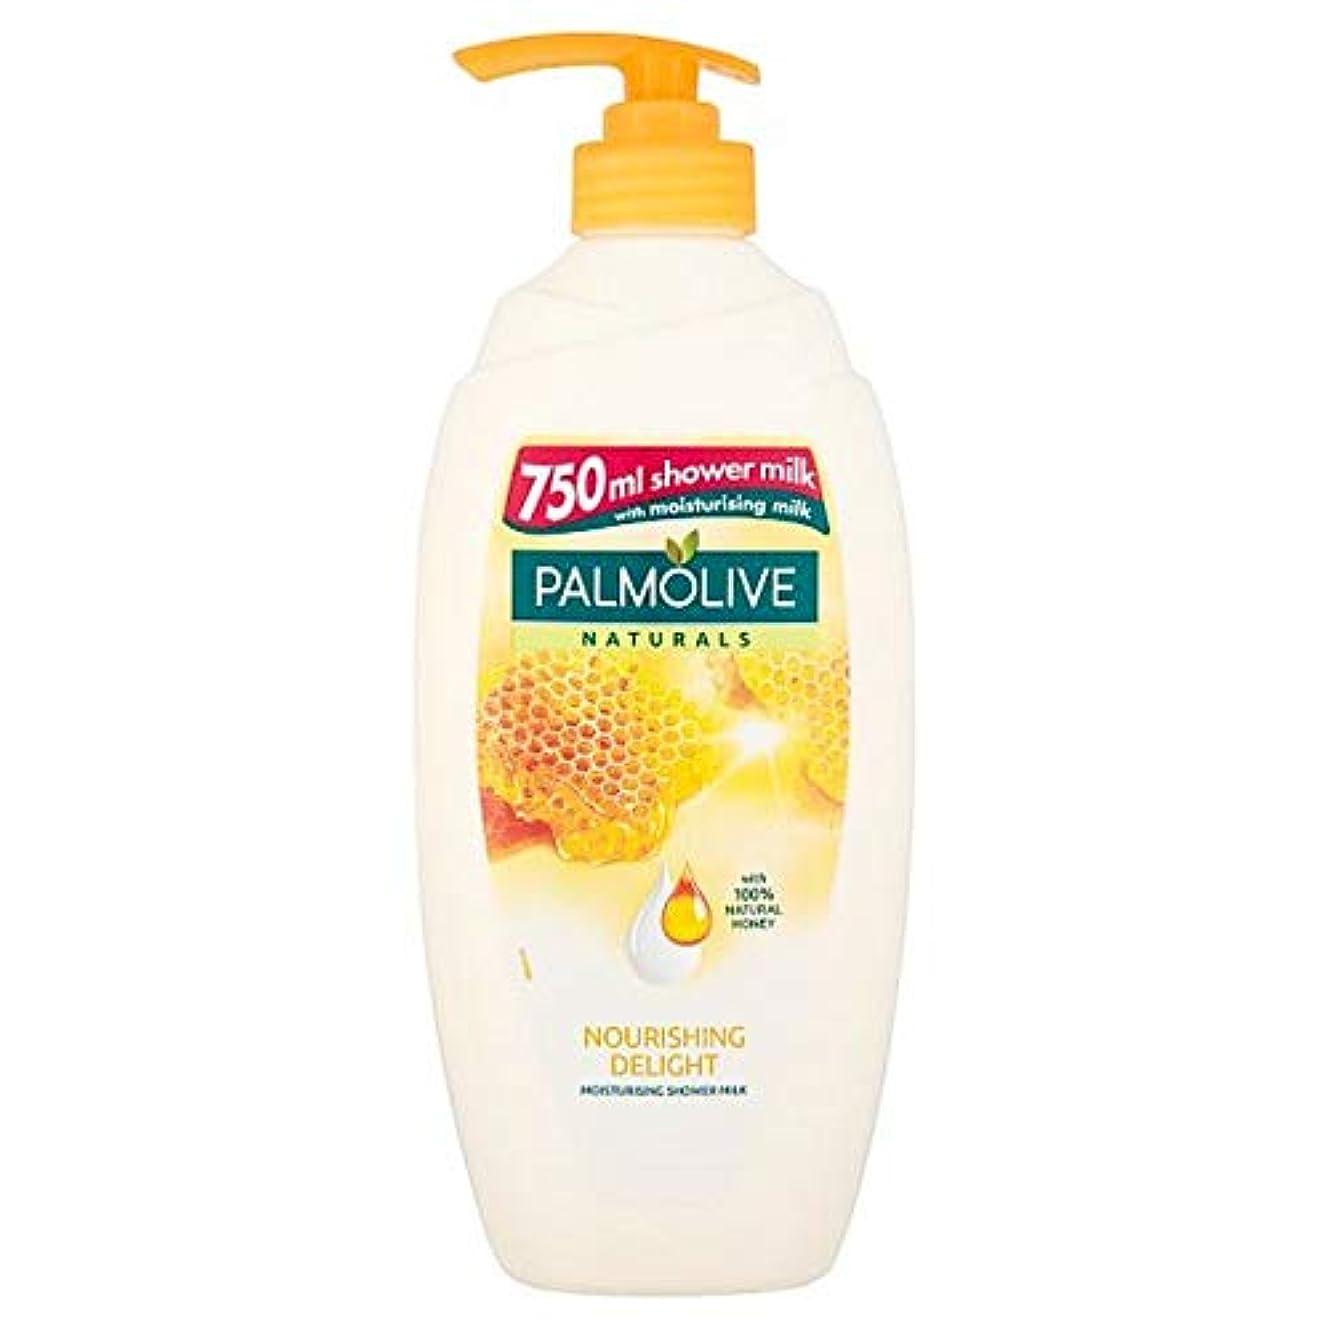 [Palmolive ] パルモナチュラルミルクとはちみつシャワージェル750ミリリットル - Palmolive Naturals Milk And Honey Shower Gel 750Ml [並行輸入品]